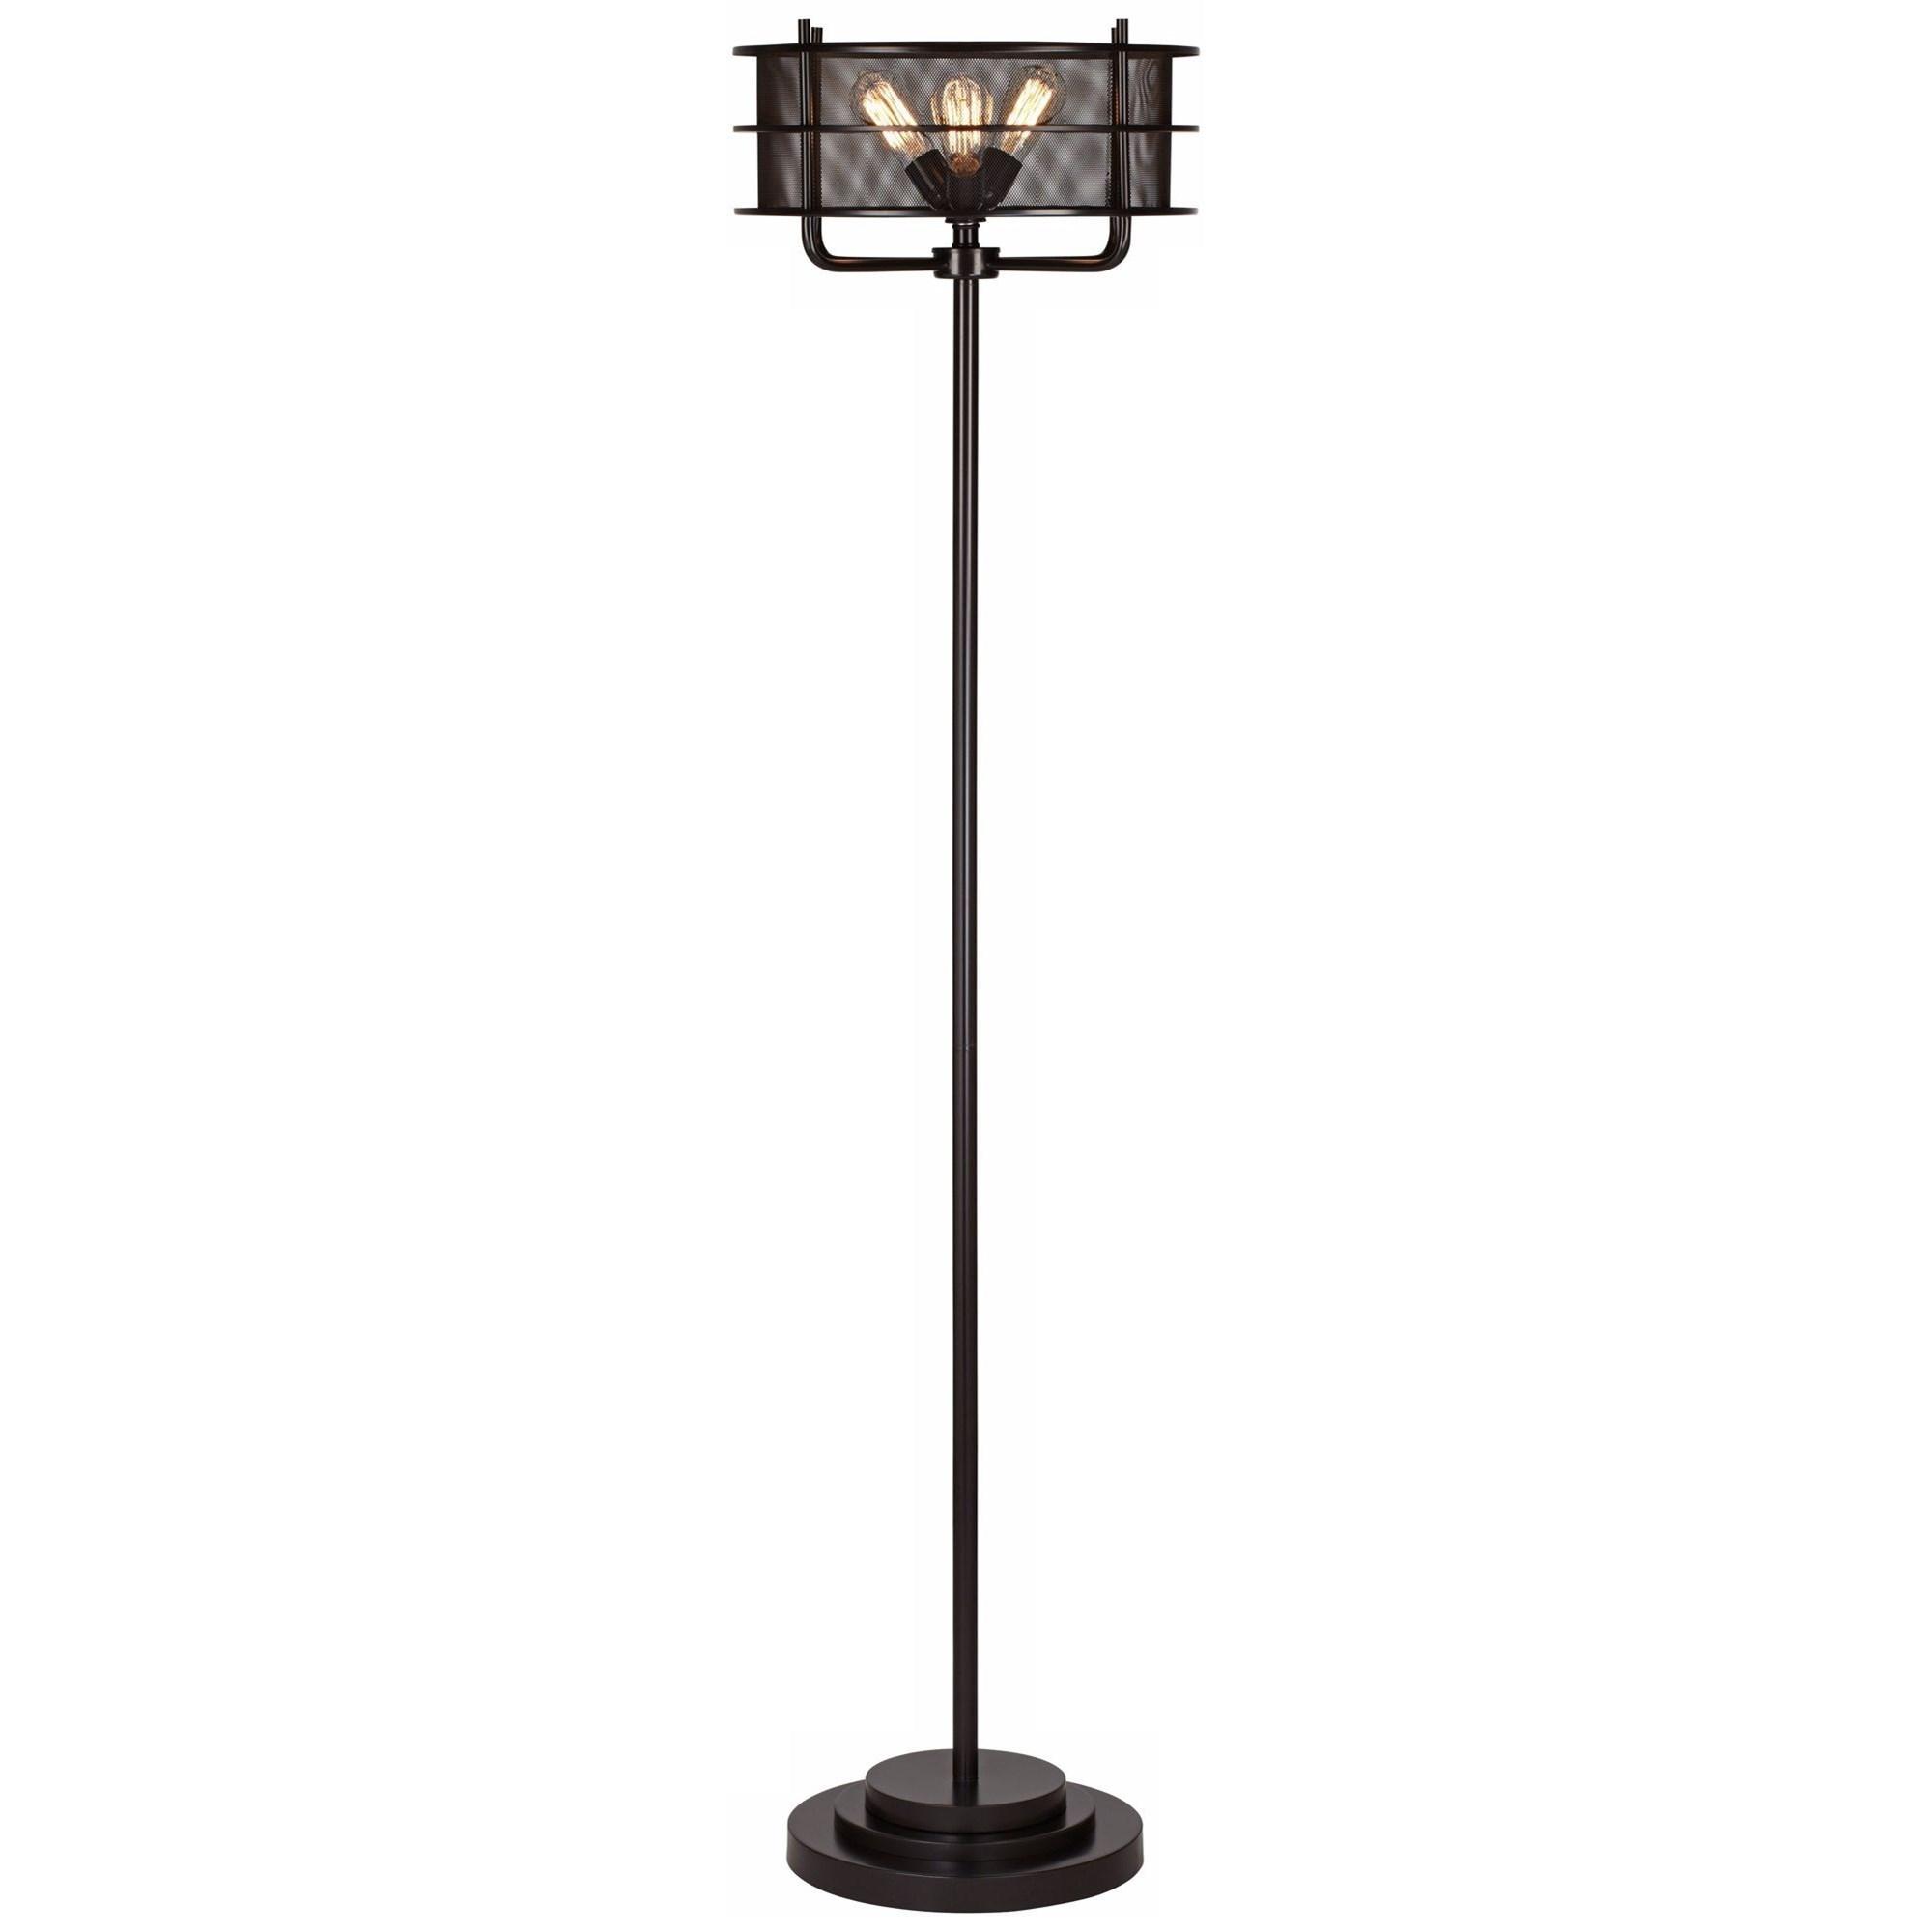 Ovation Industrial Floor Lamp